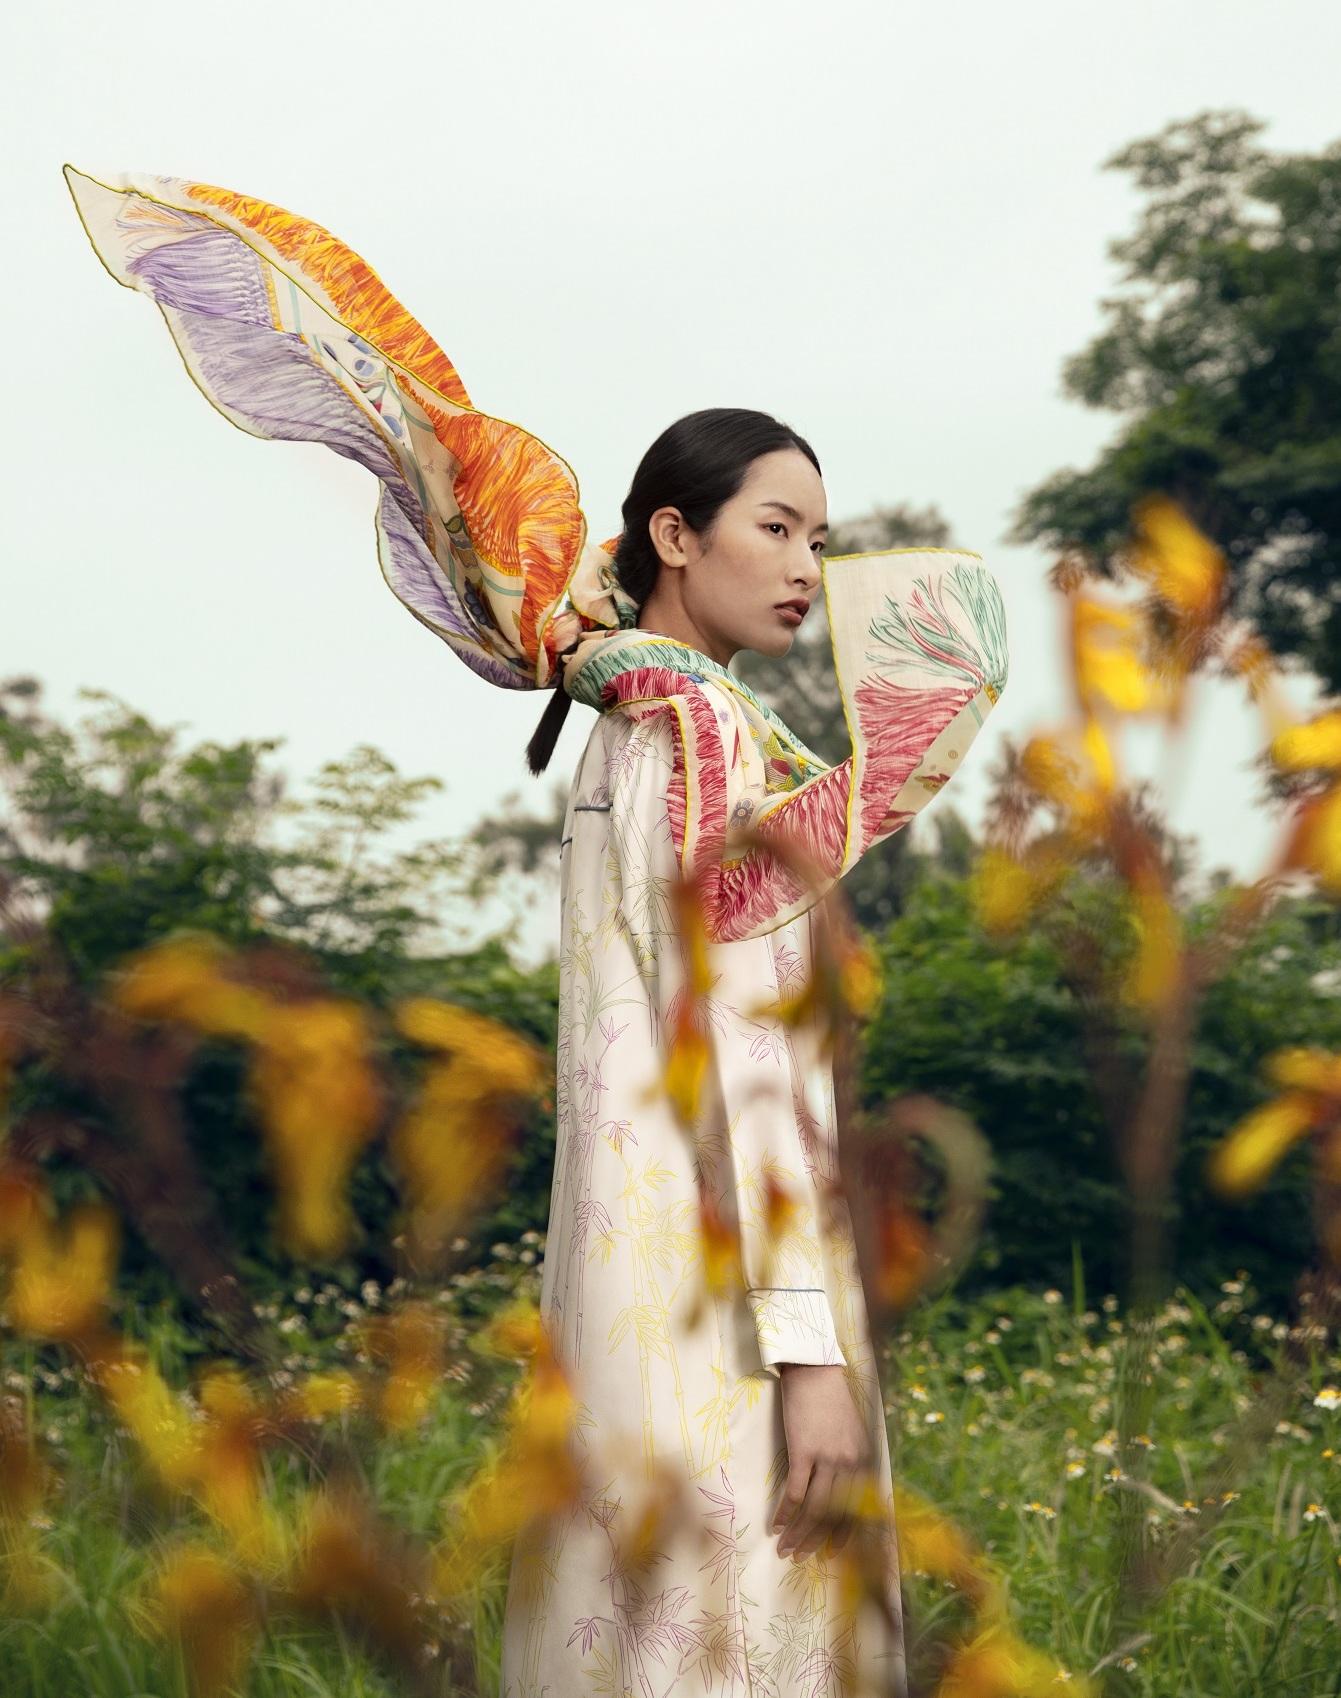 kwan nam candy bamboo shirt and scarf